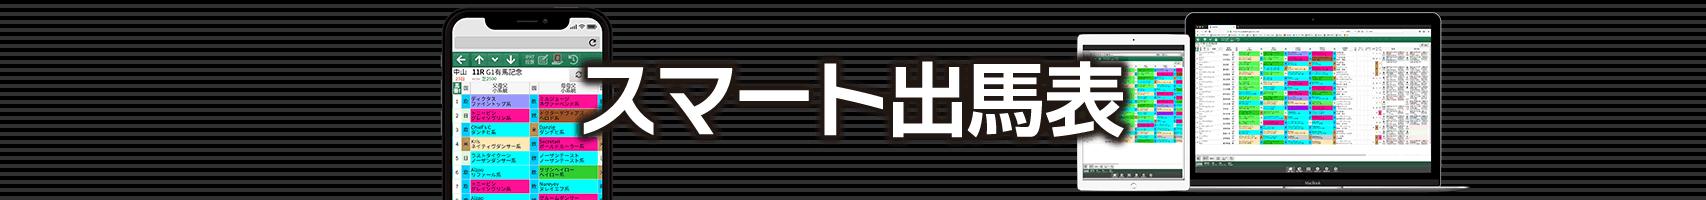 【無料公開】 東京新聞杯/スマート出馬表 – 基本&血統・系統&ローテ・順位&種牡馬データ画面